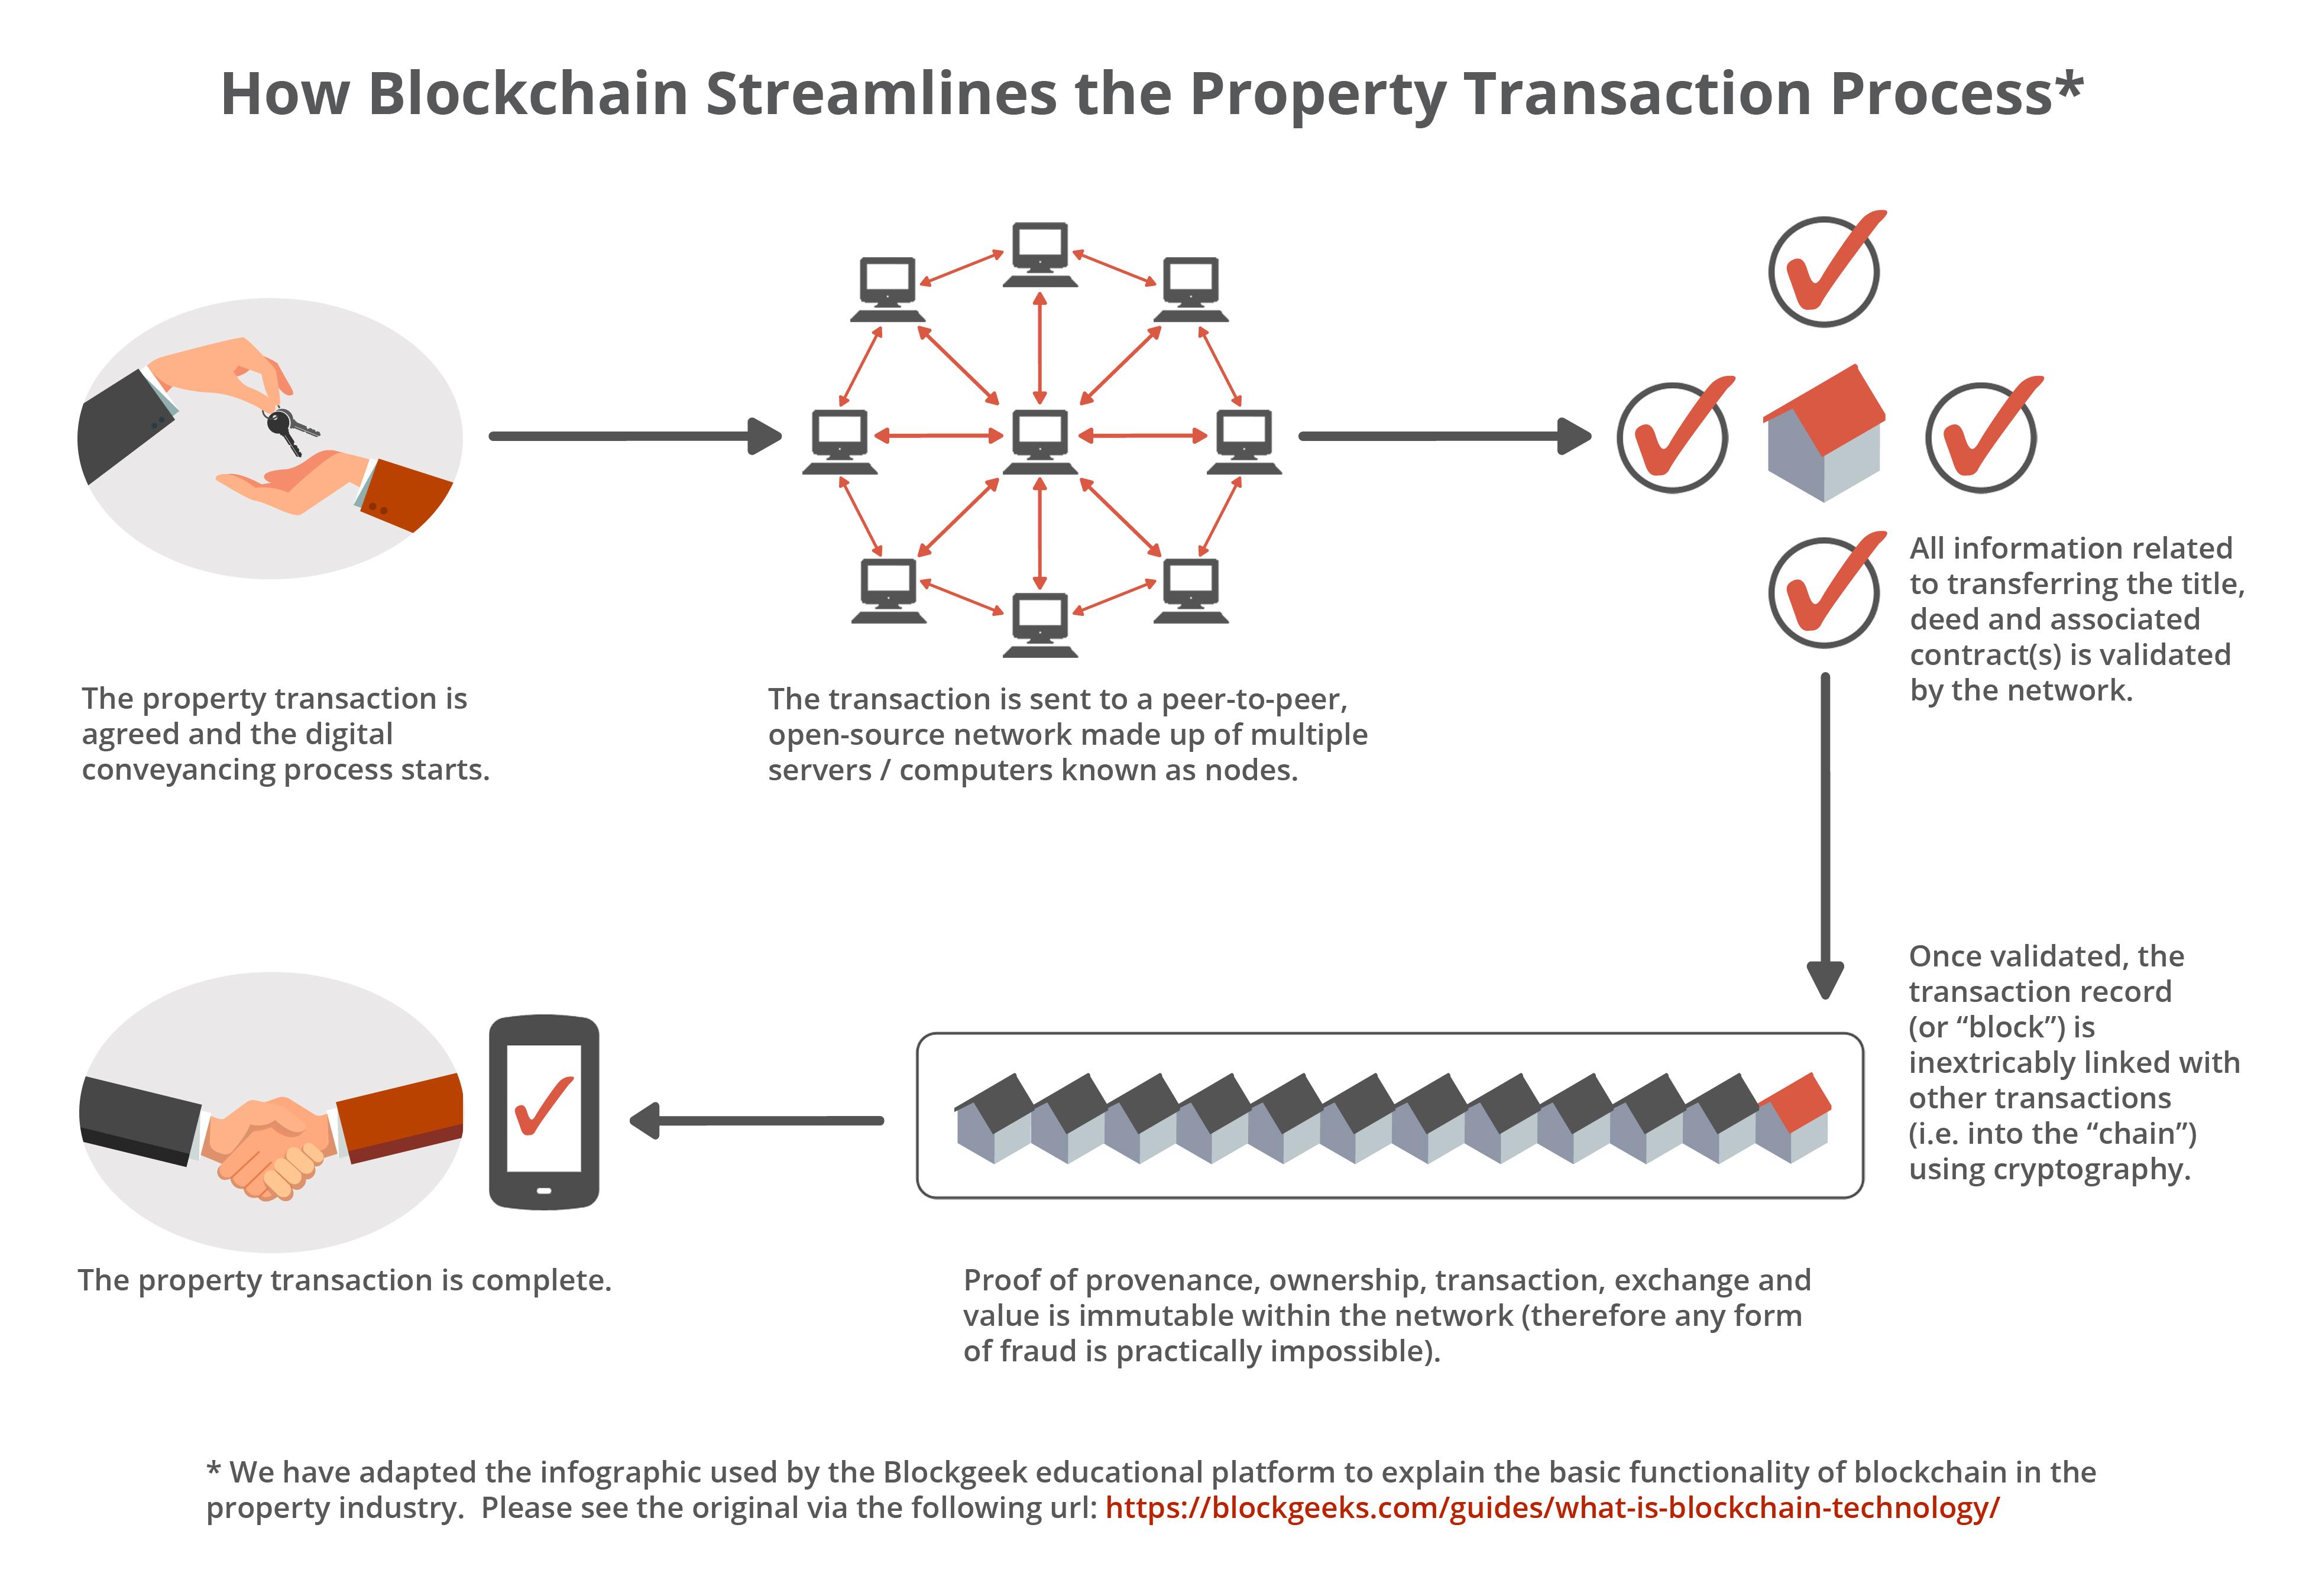 How Blockchain Streamlines the Property Transaction Process